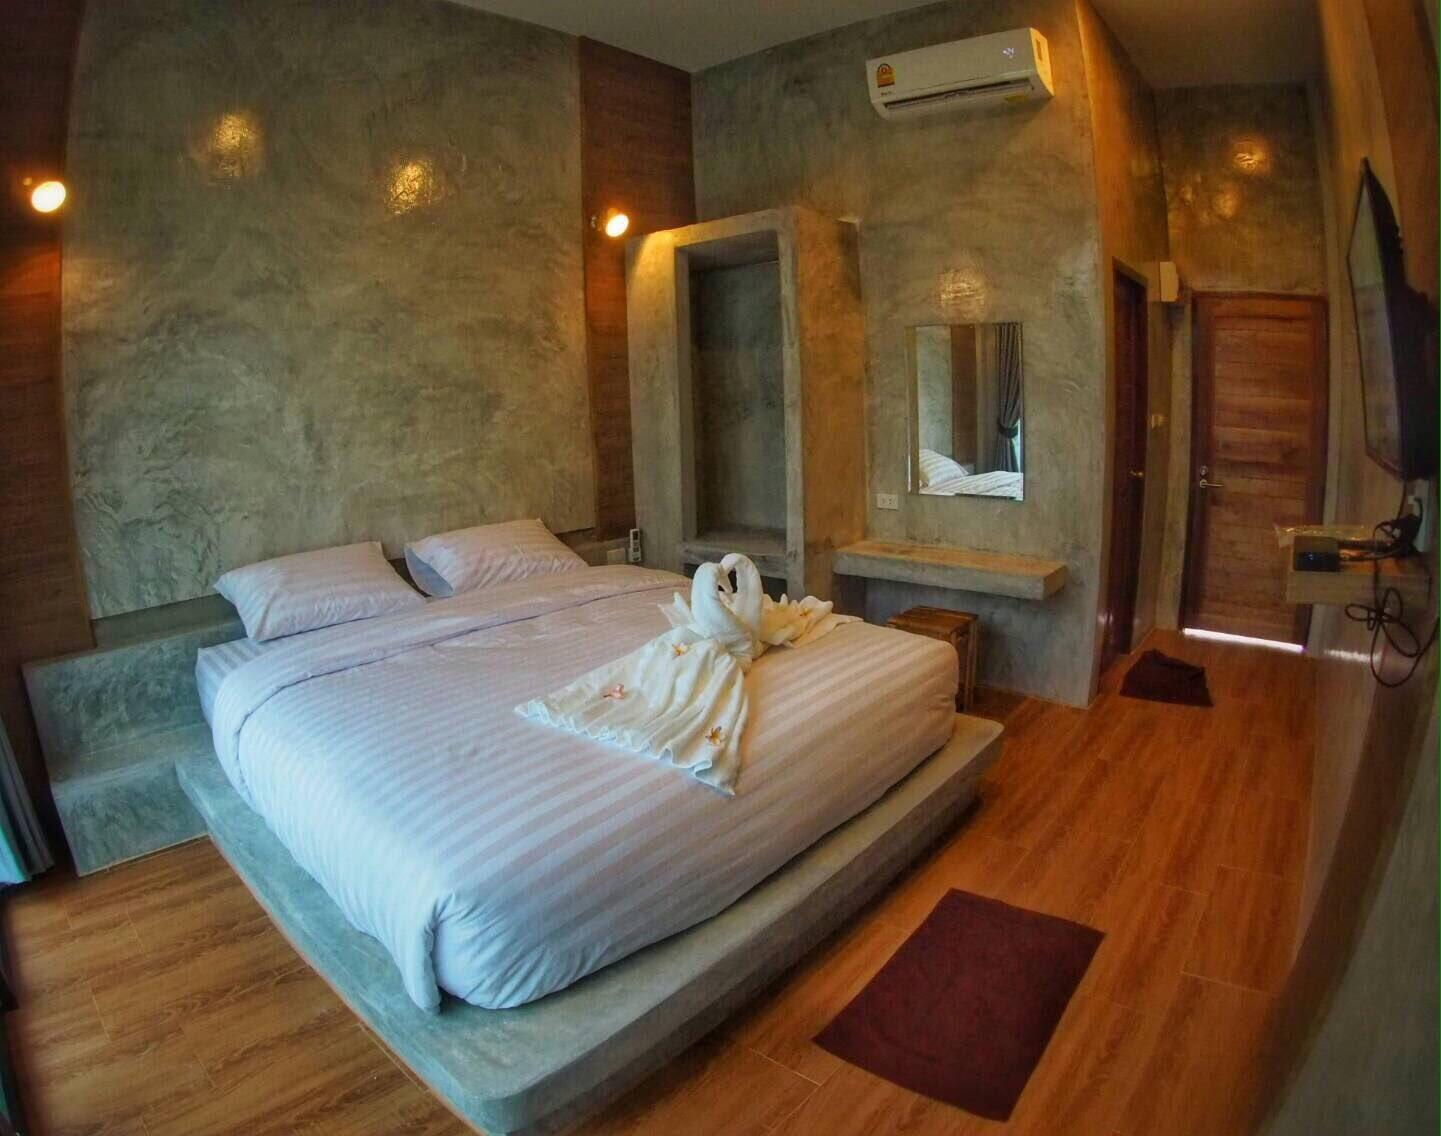 巴真武里阿林达度假村,Alinda Resort Phetchaburi